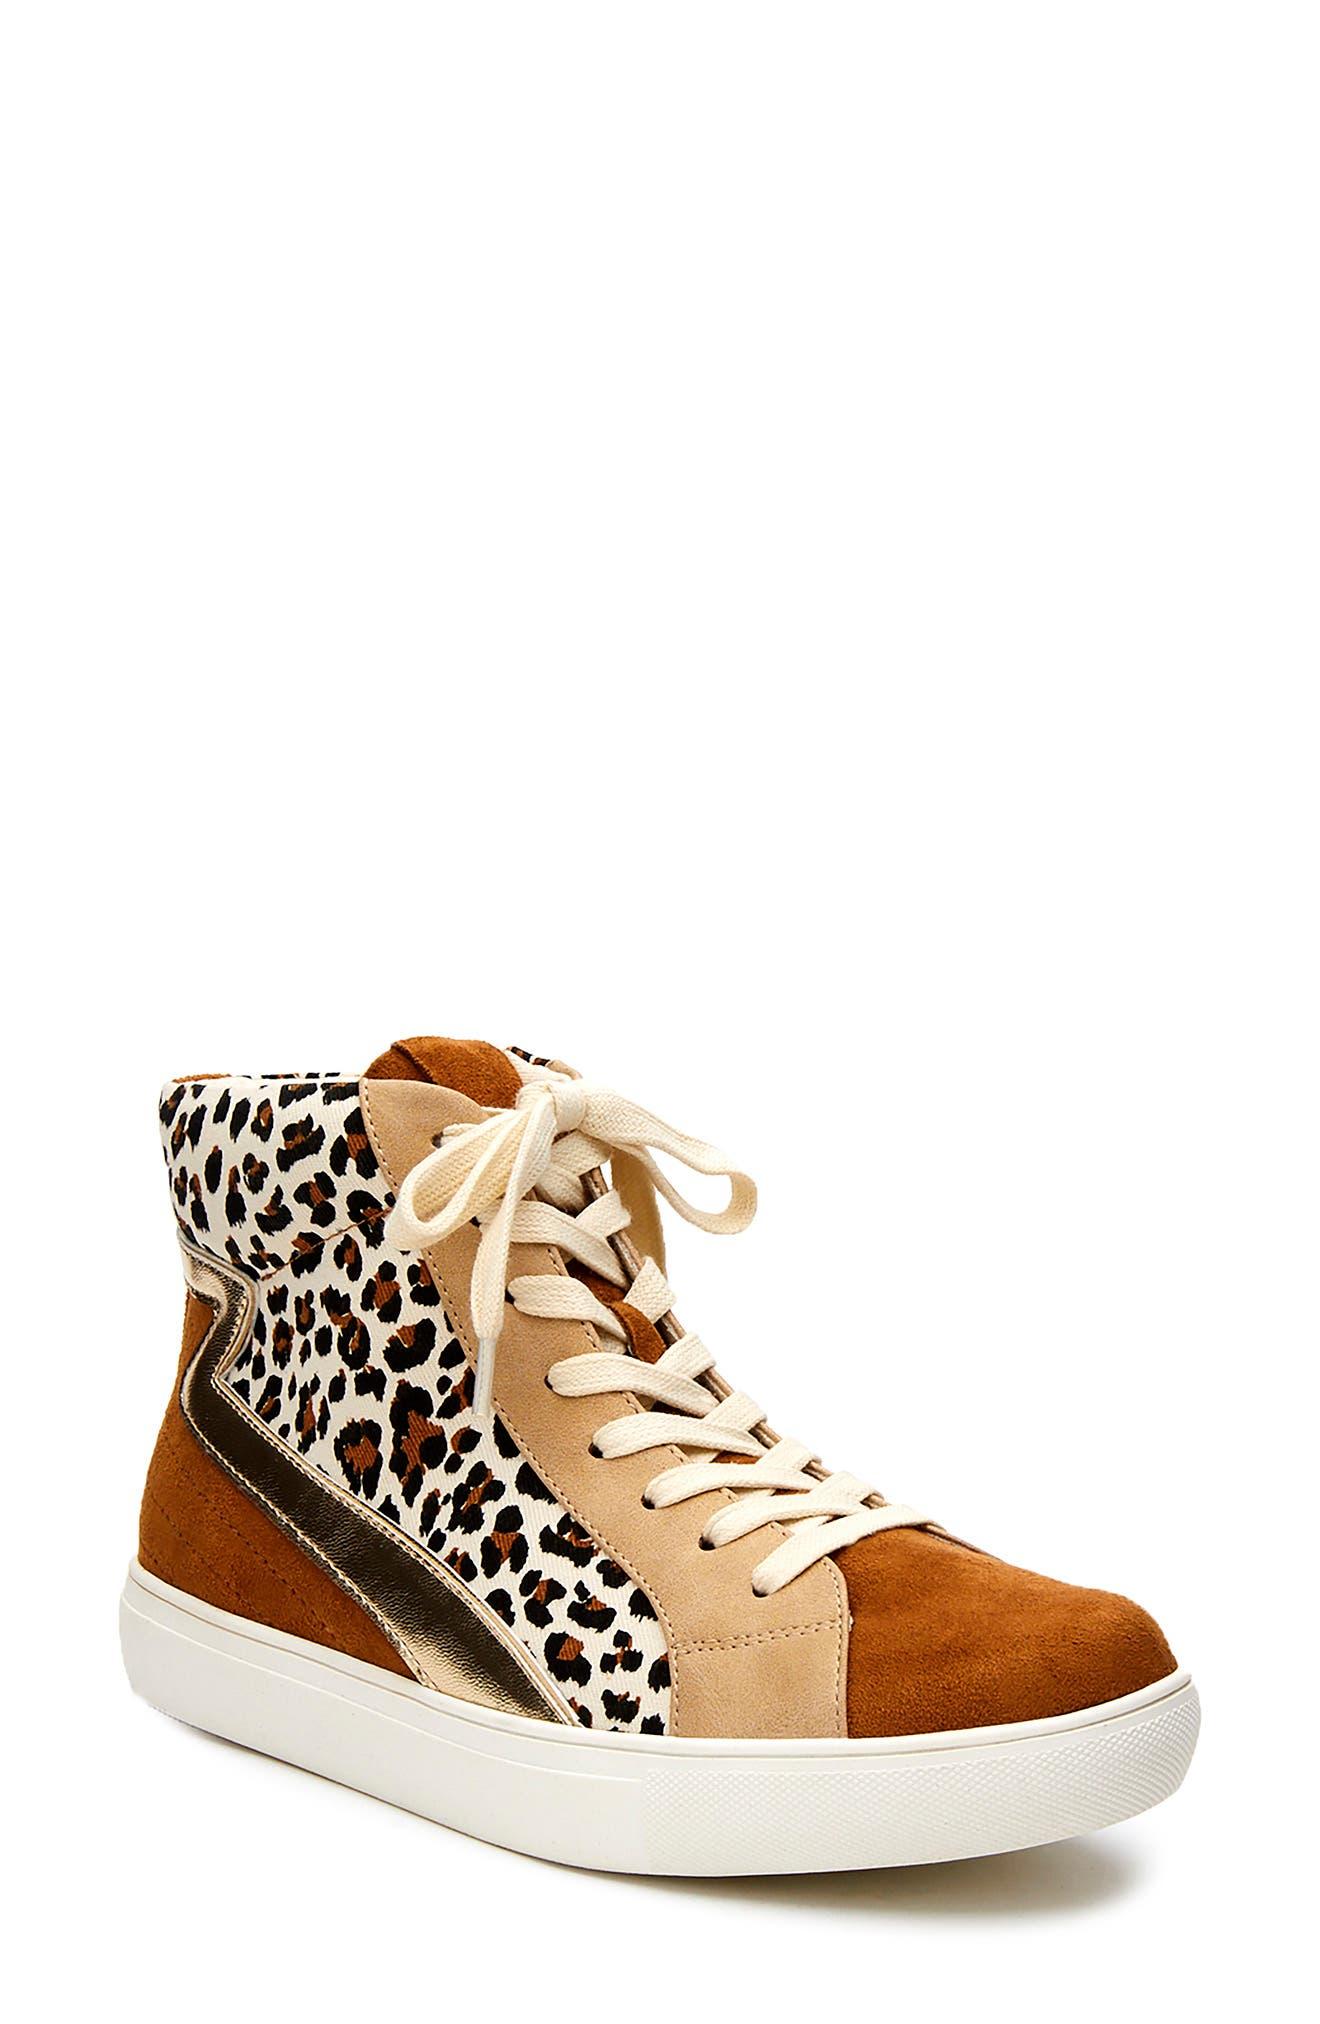 Matchmaker Sneaker